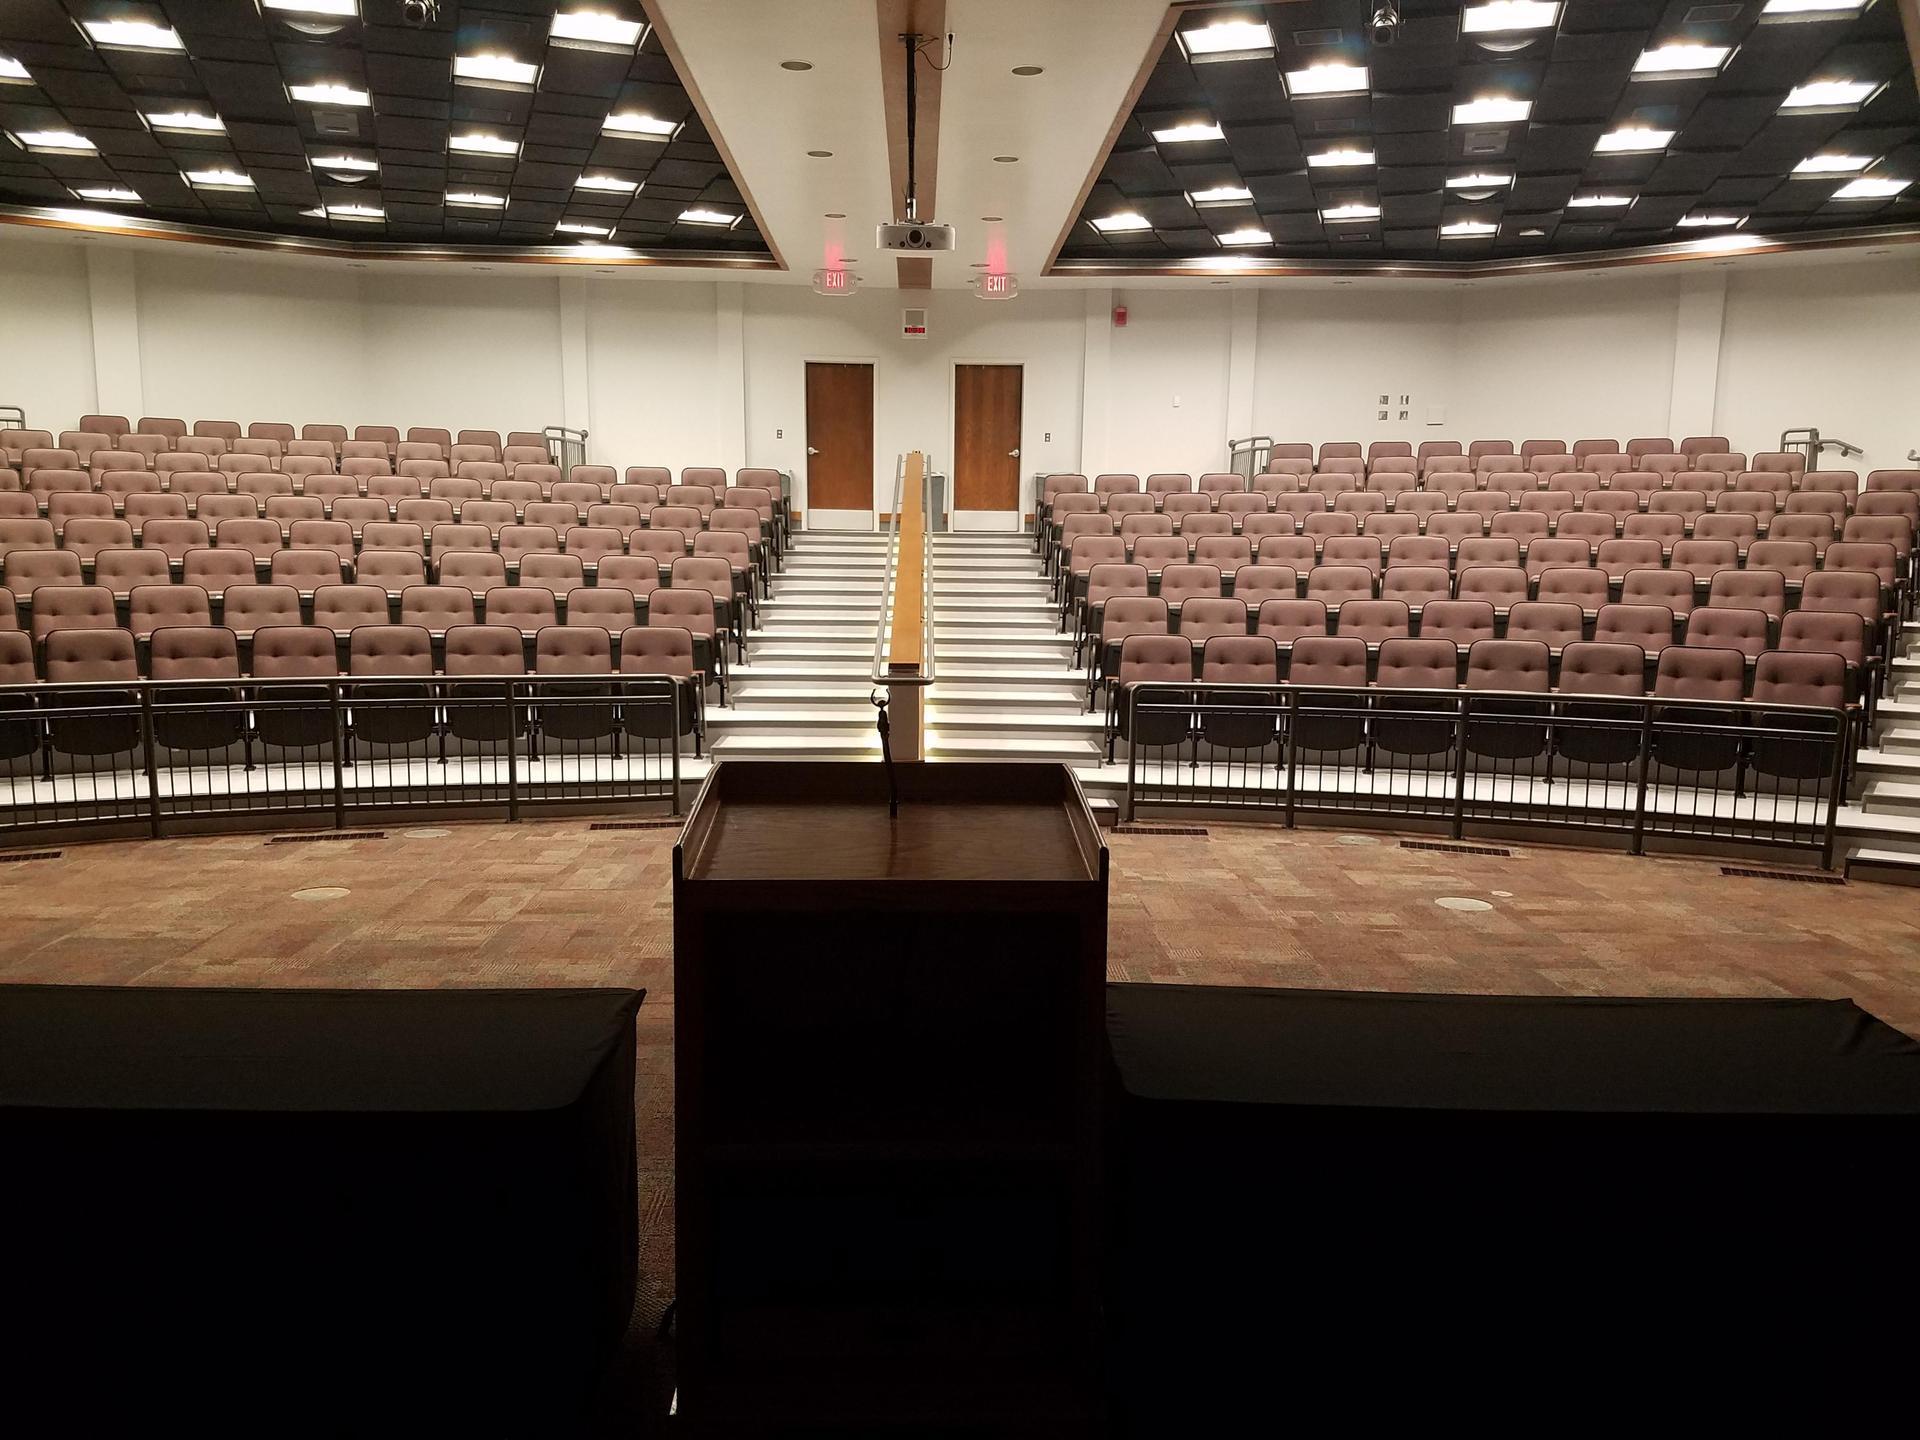 Seminar Center Theater Seats